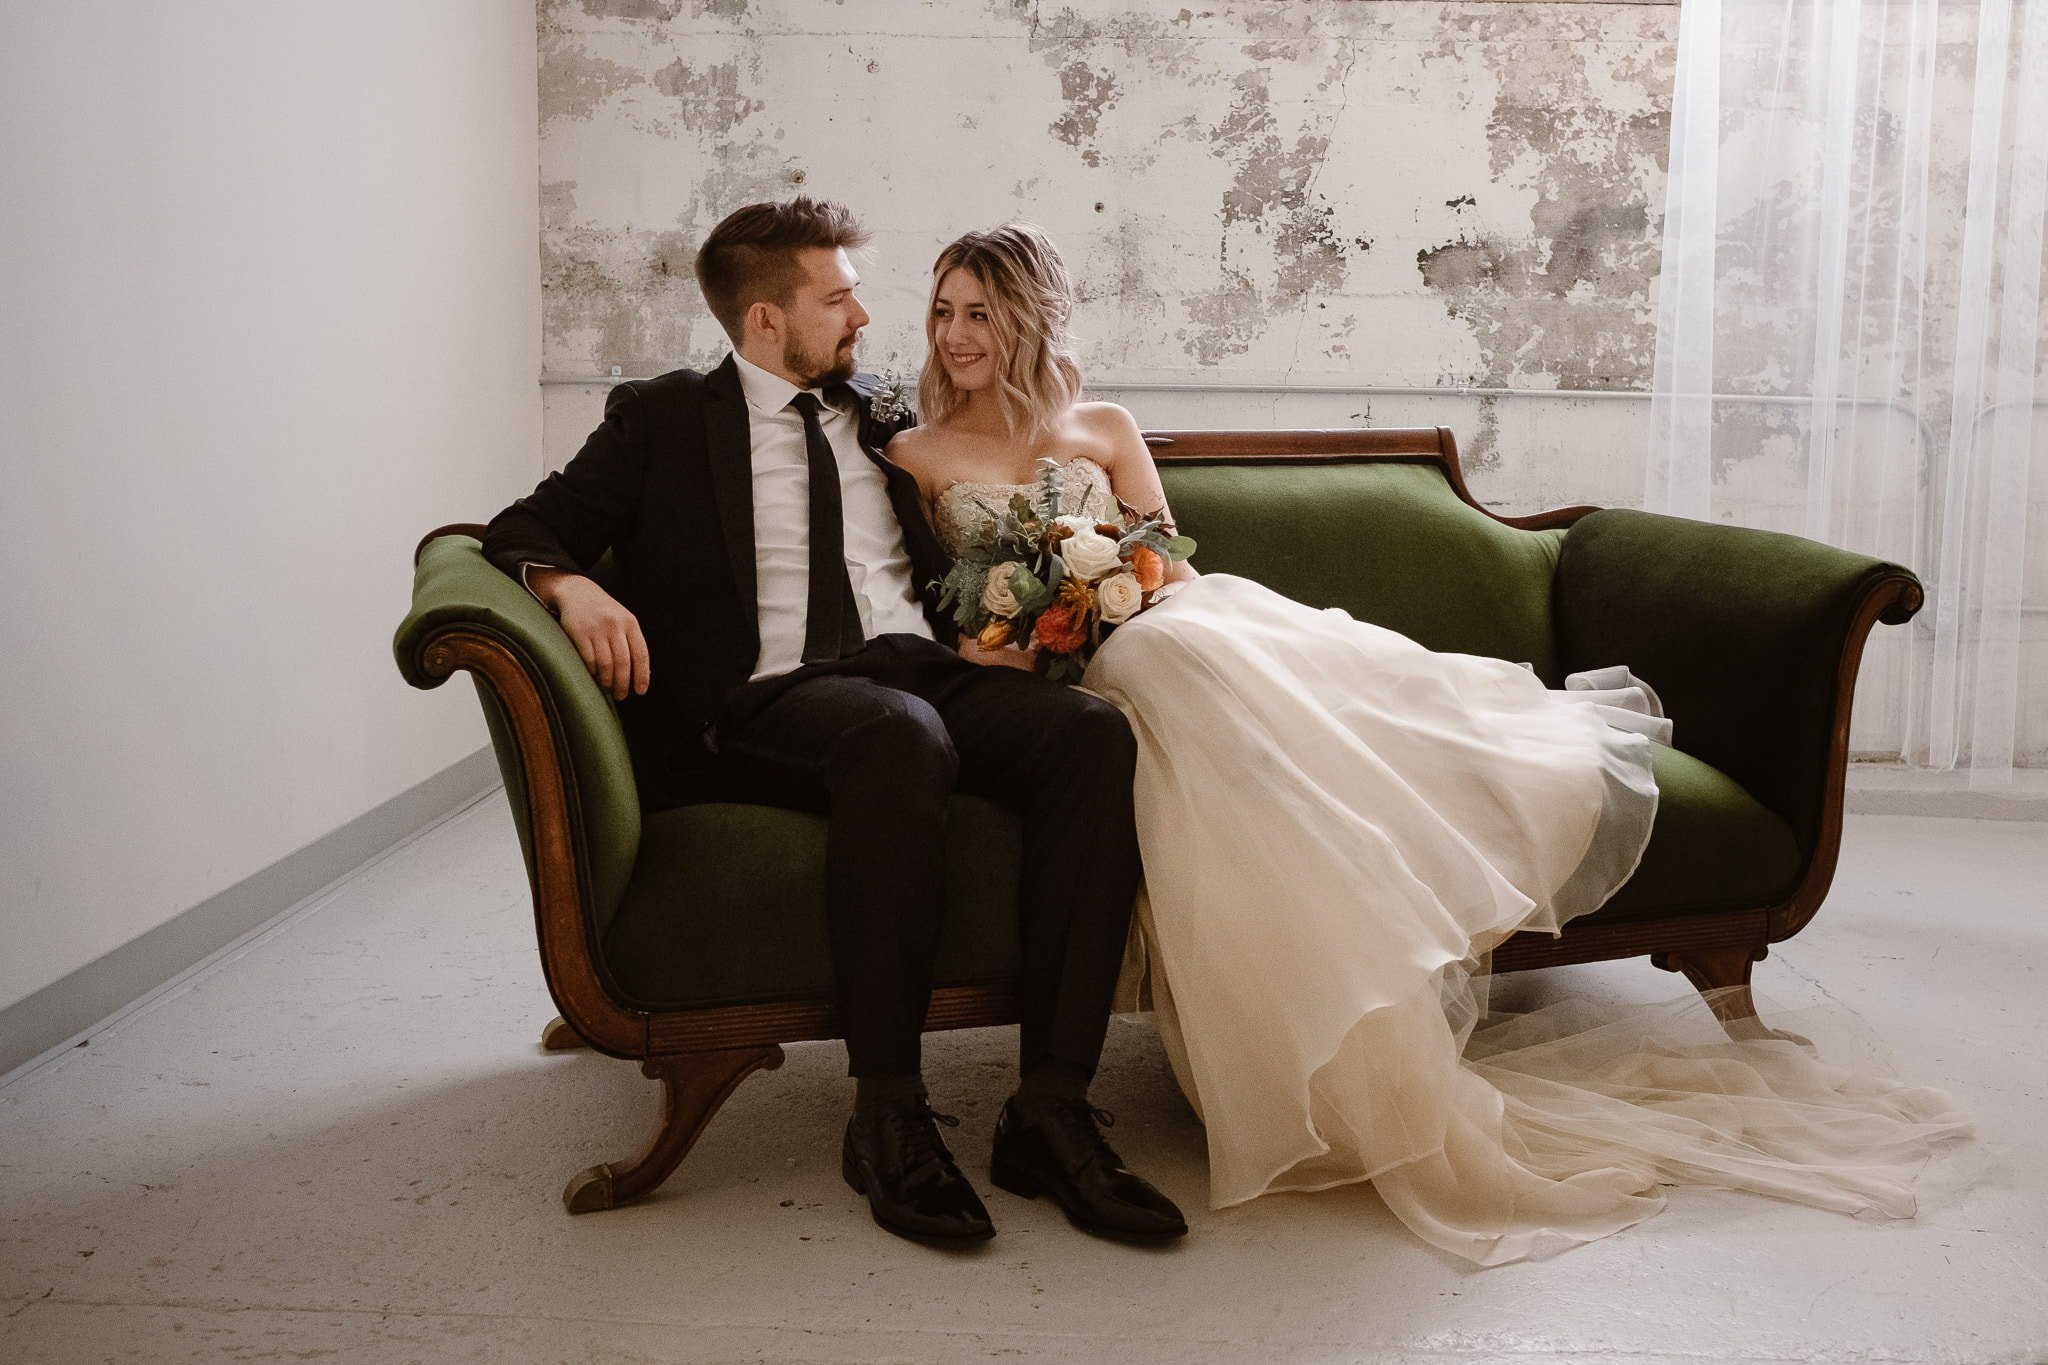 St Vrain Wedding Photographer   Longmont Wedding Photographer   Colorado Winter Wedding Photographer, Colorado industrial chic wedding, bride and groom portraits